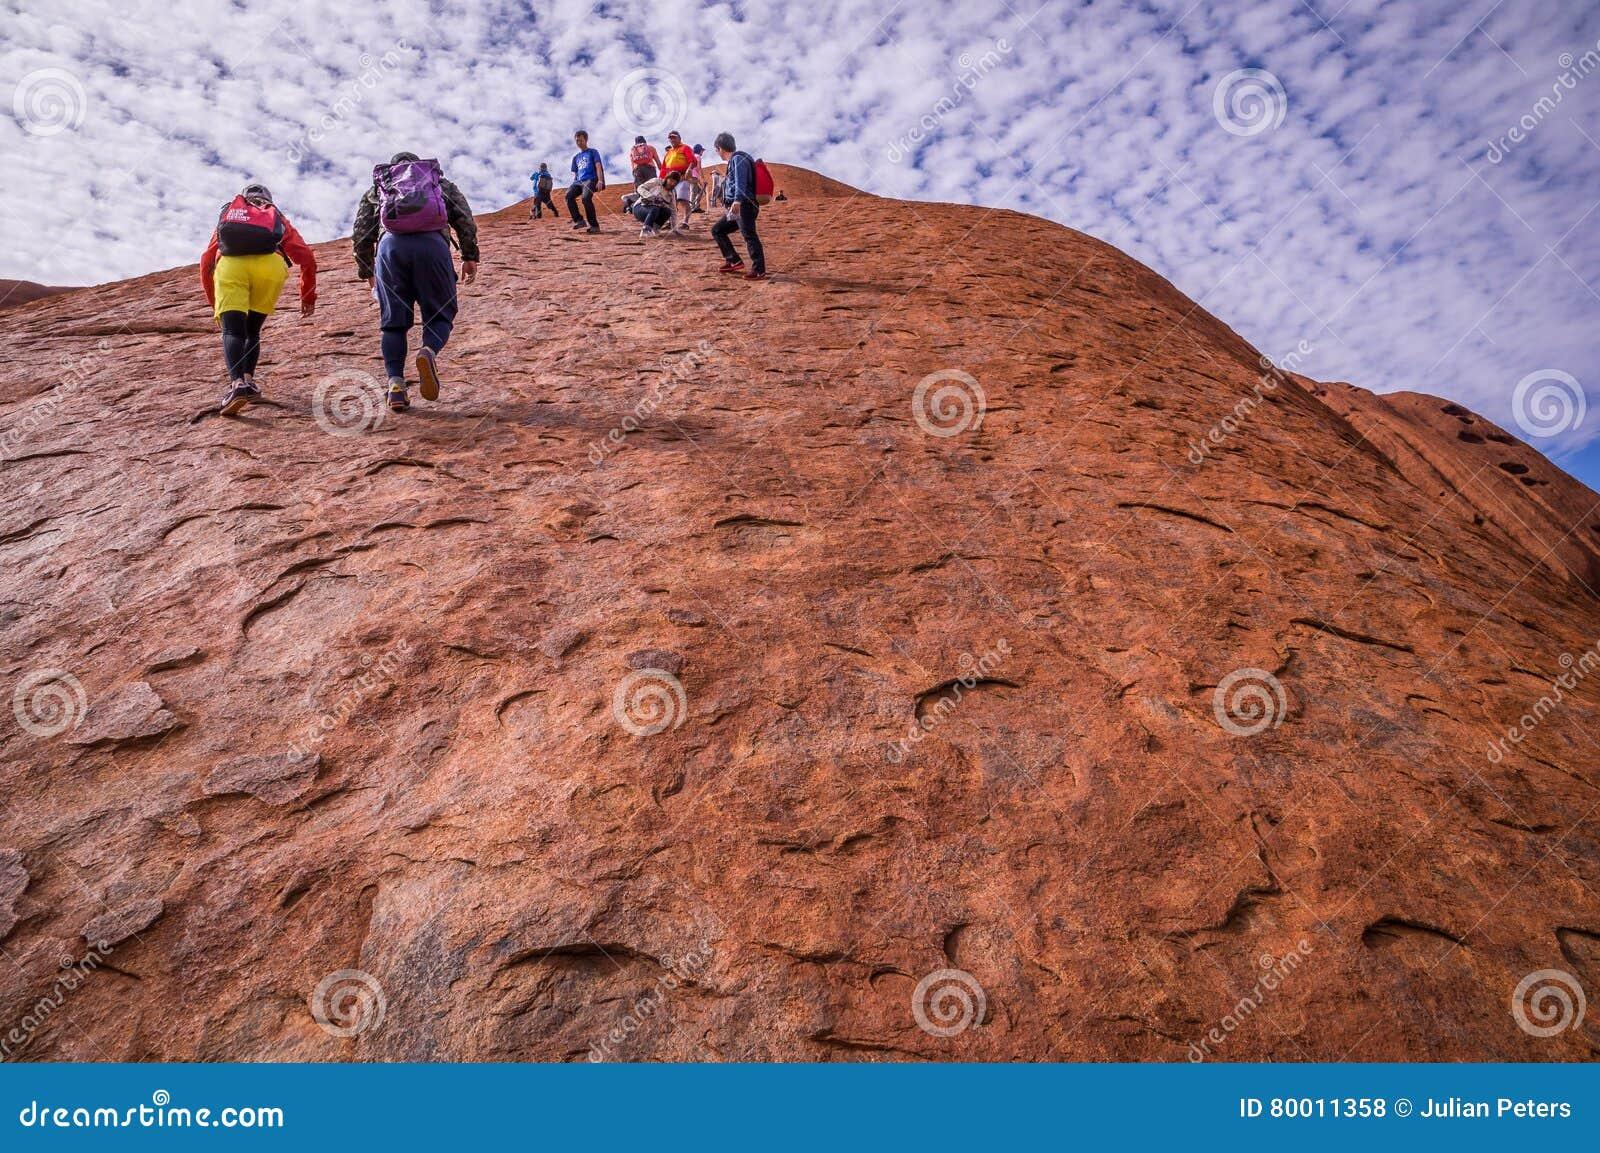 Turistas que escalam a rocha de Uluru Ayers